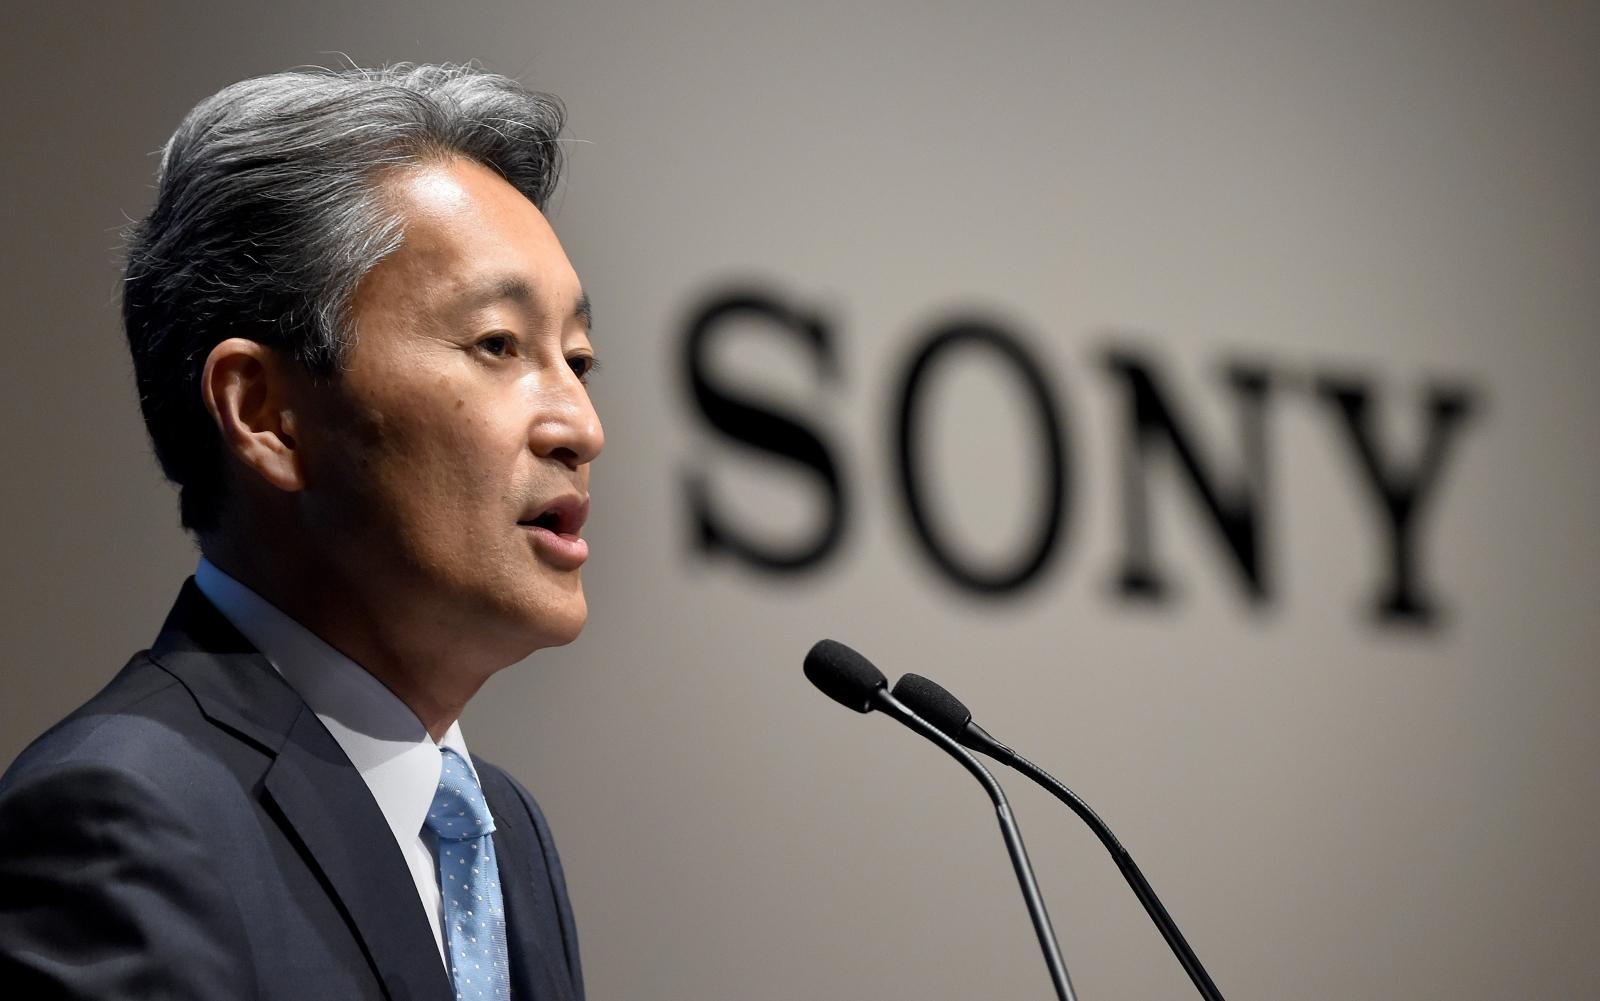 Sony CEO Kaz Hirai